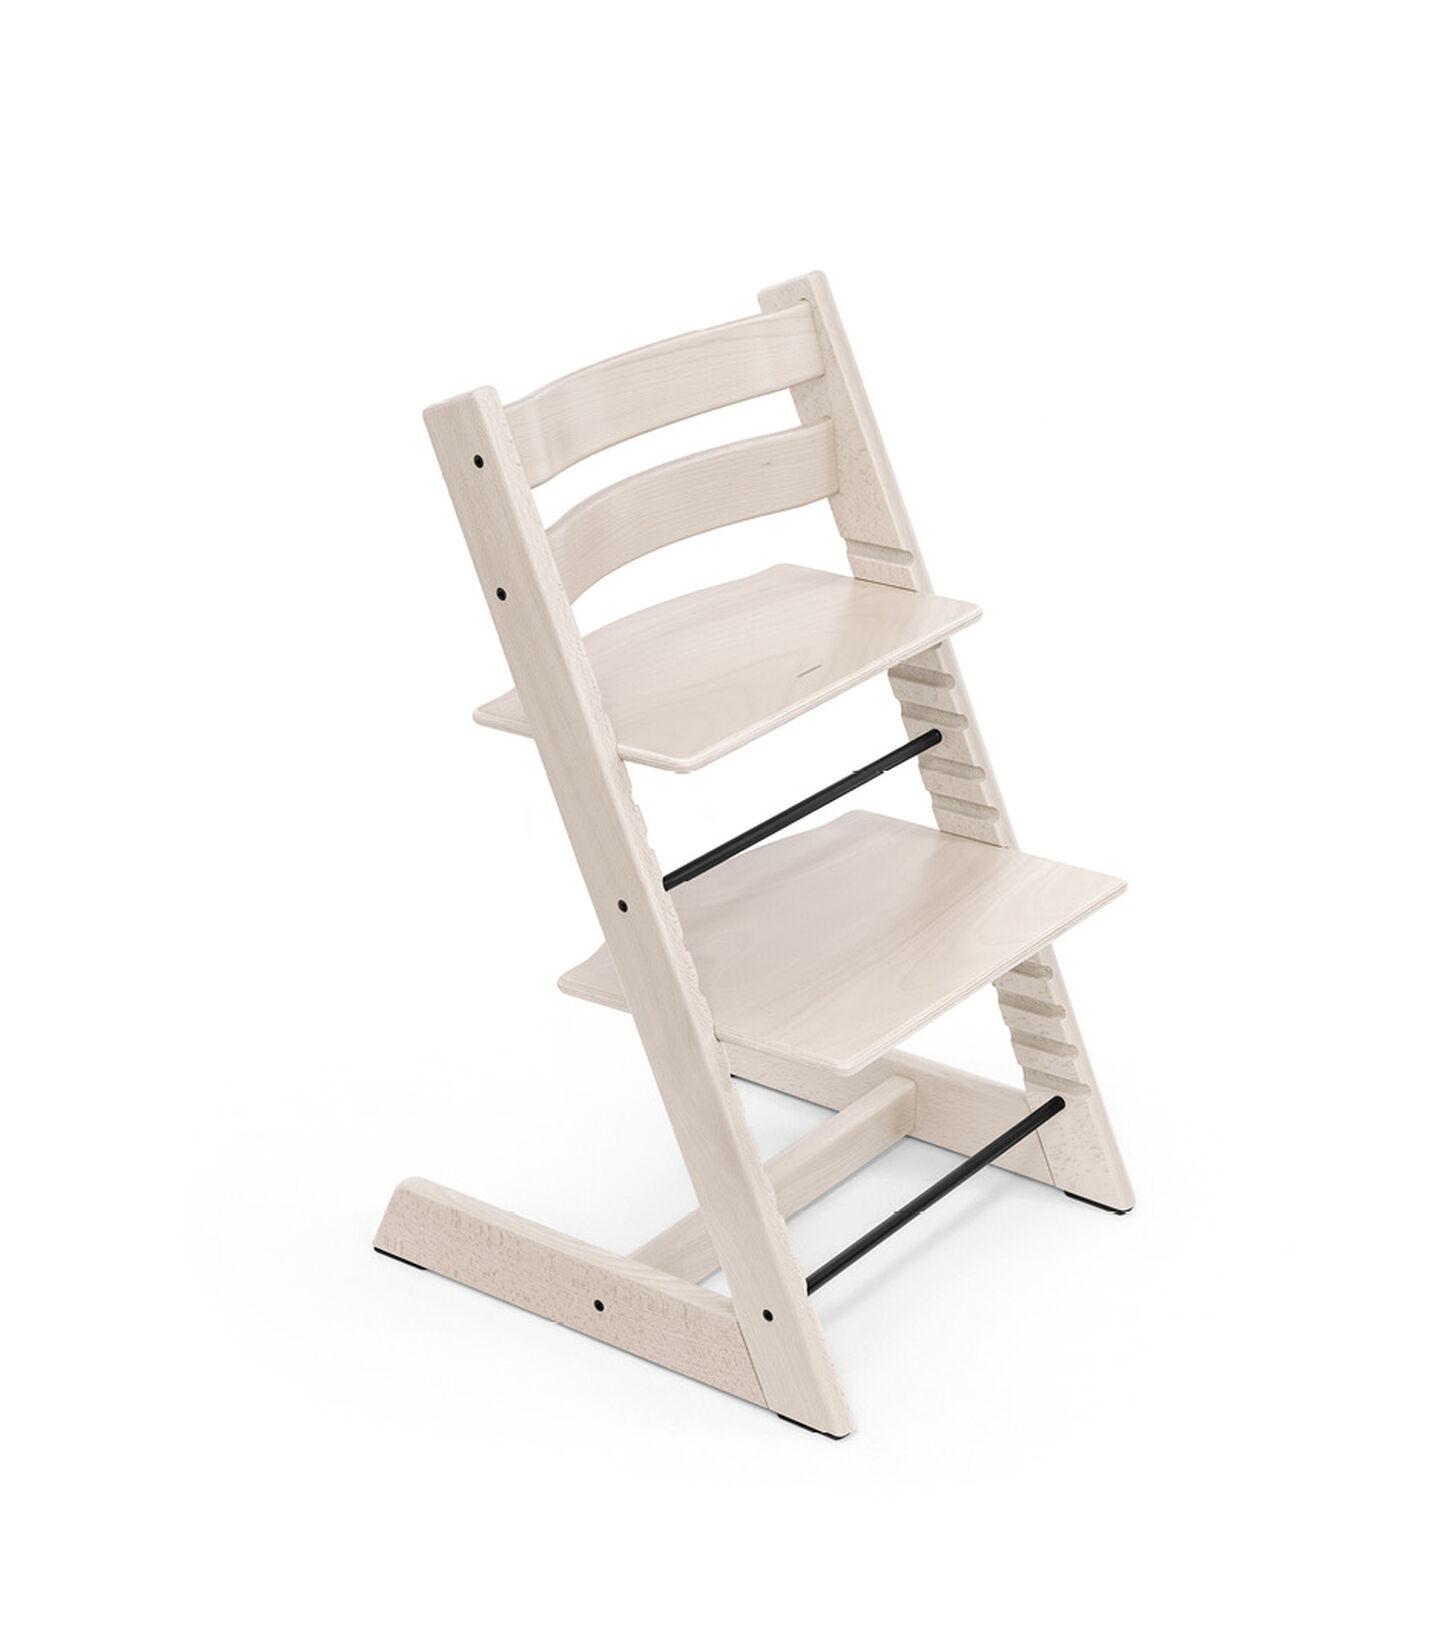 Krzesło Tripp Trapp® Whitewash, Whitewash, mainview view 2